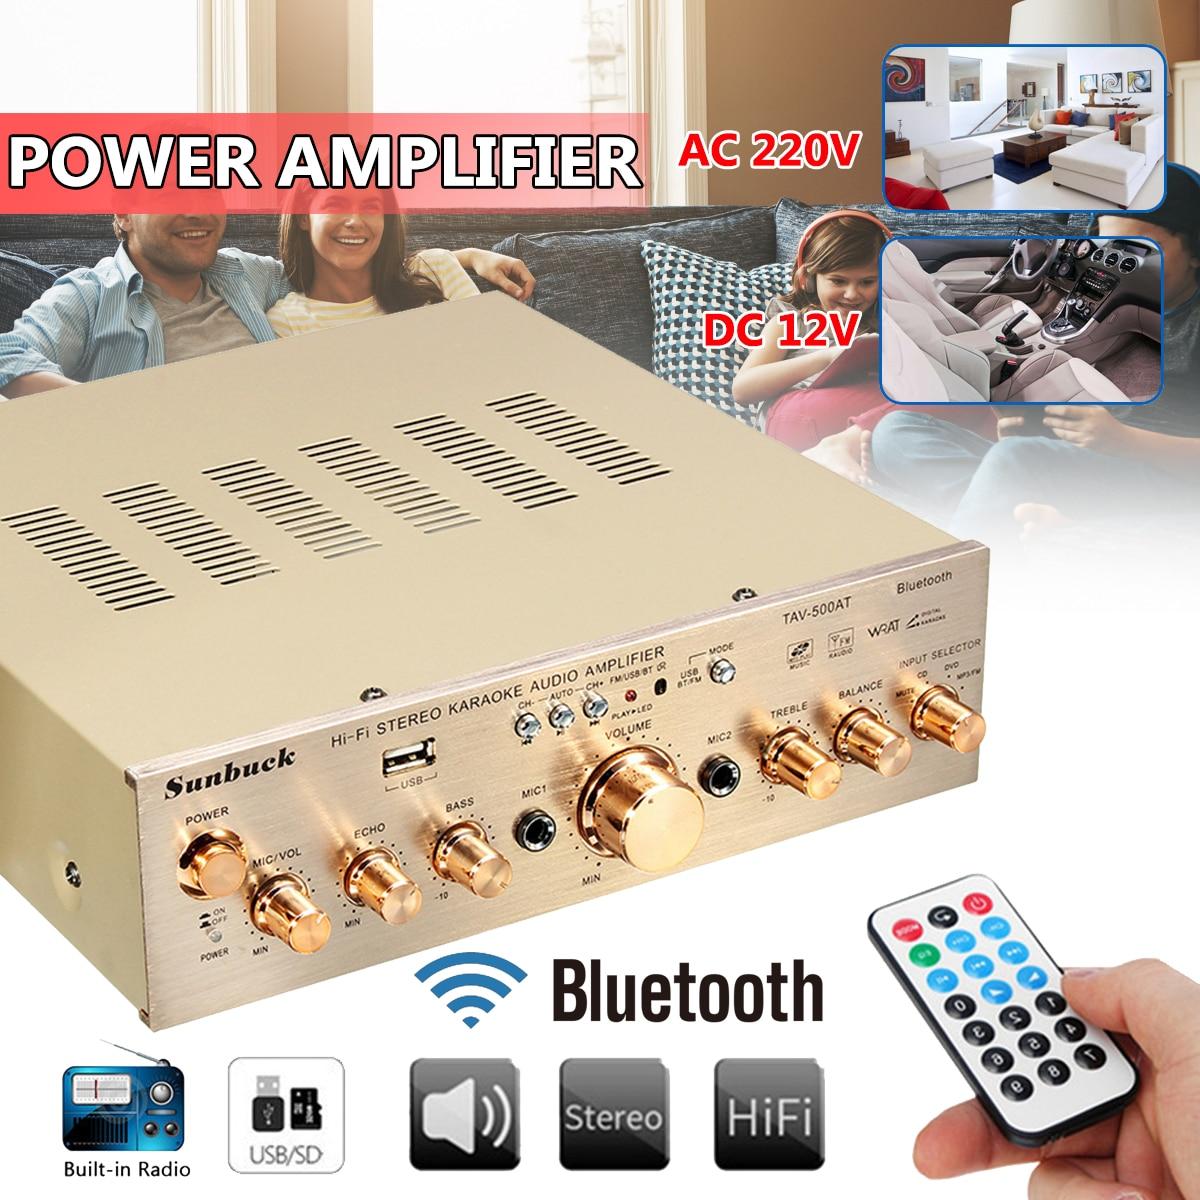 Sunbuck 12V/ 220V 600W HIFI Car Audio Stereo Power Amplifier Bluetooth Audio Karaoke Amplifiers Car Home Theater Amplifiers lusya bluetooth subwoofer digital amplifier board dual microphone karaoke amplifiers 12v 24v 220v